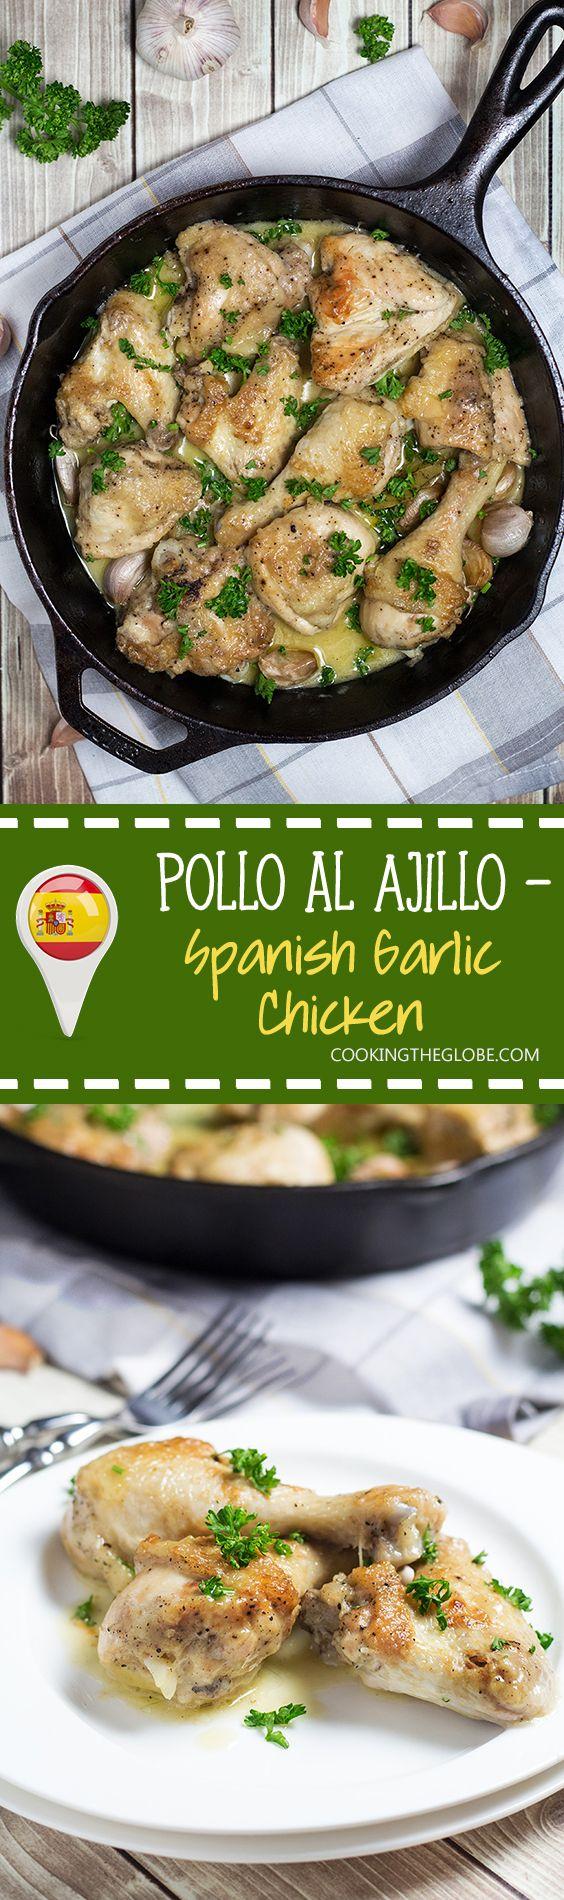 Pollo al Ajillo is a Spanish version of garlic chicken. This recipe requires only 7 ingredients to make! | cookingtheglobe.com